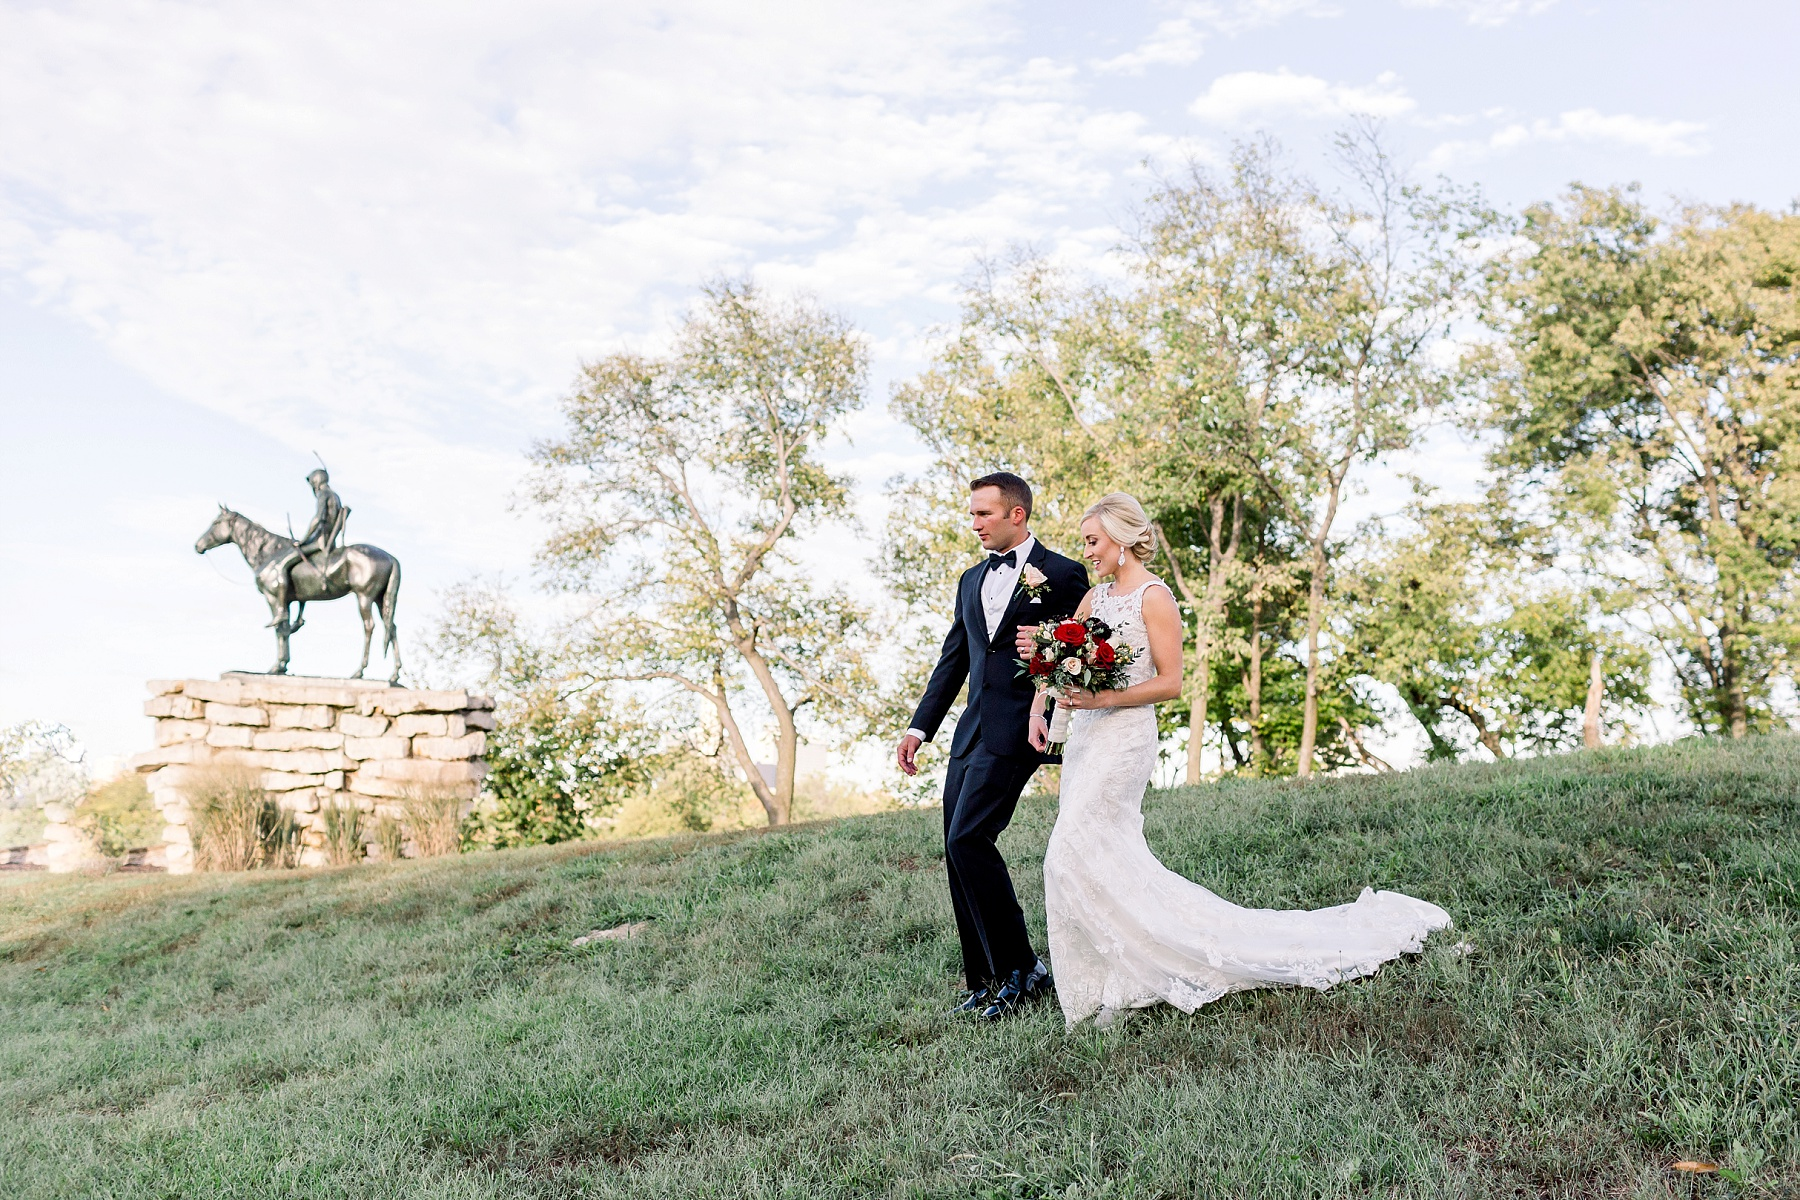 midwest-adventurous-wedding-photographer-elizabeth-ladean-photography-photo_4786.jpg